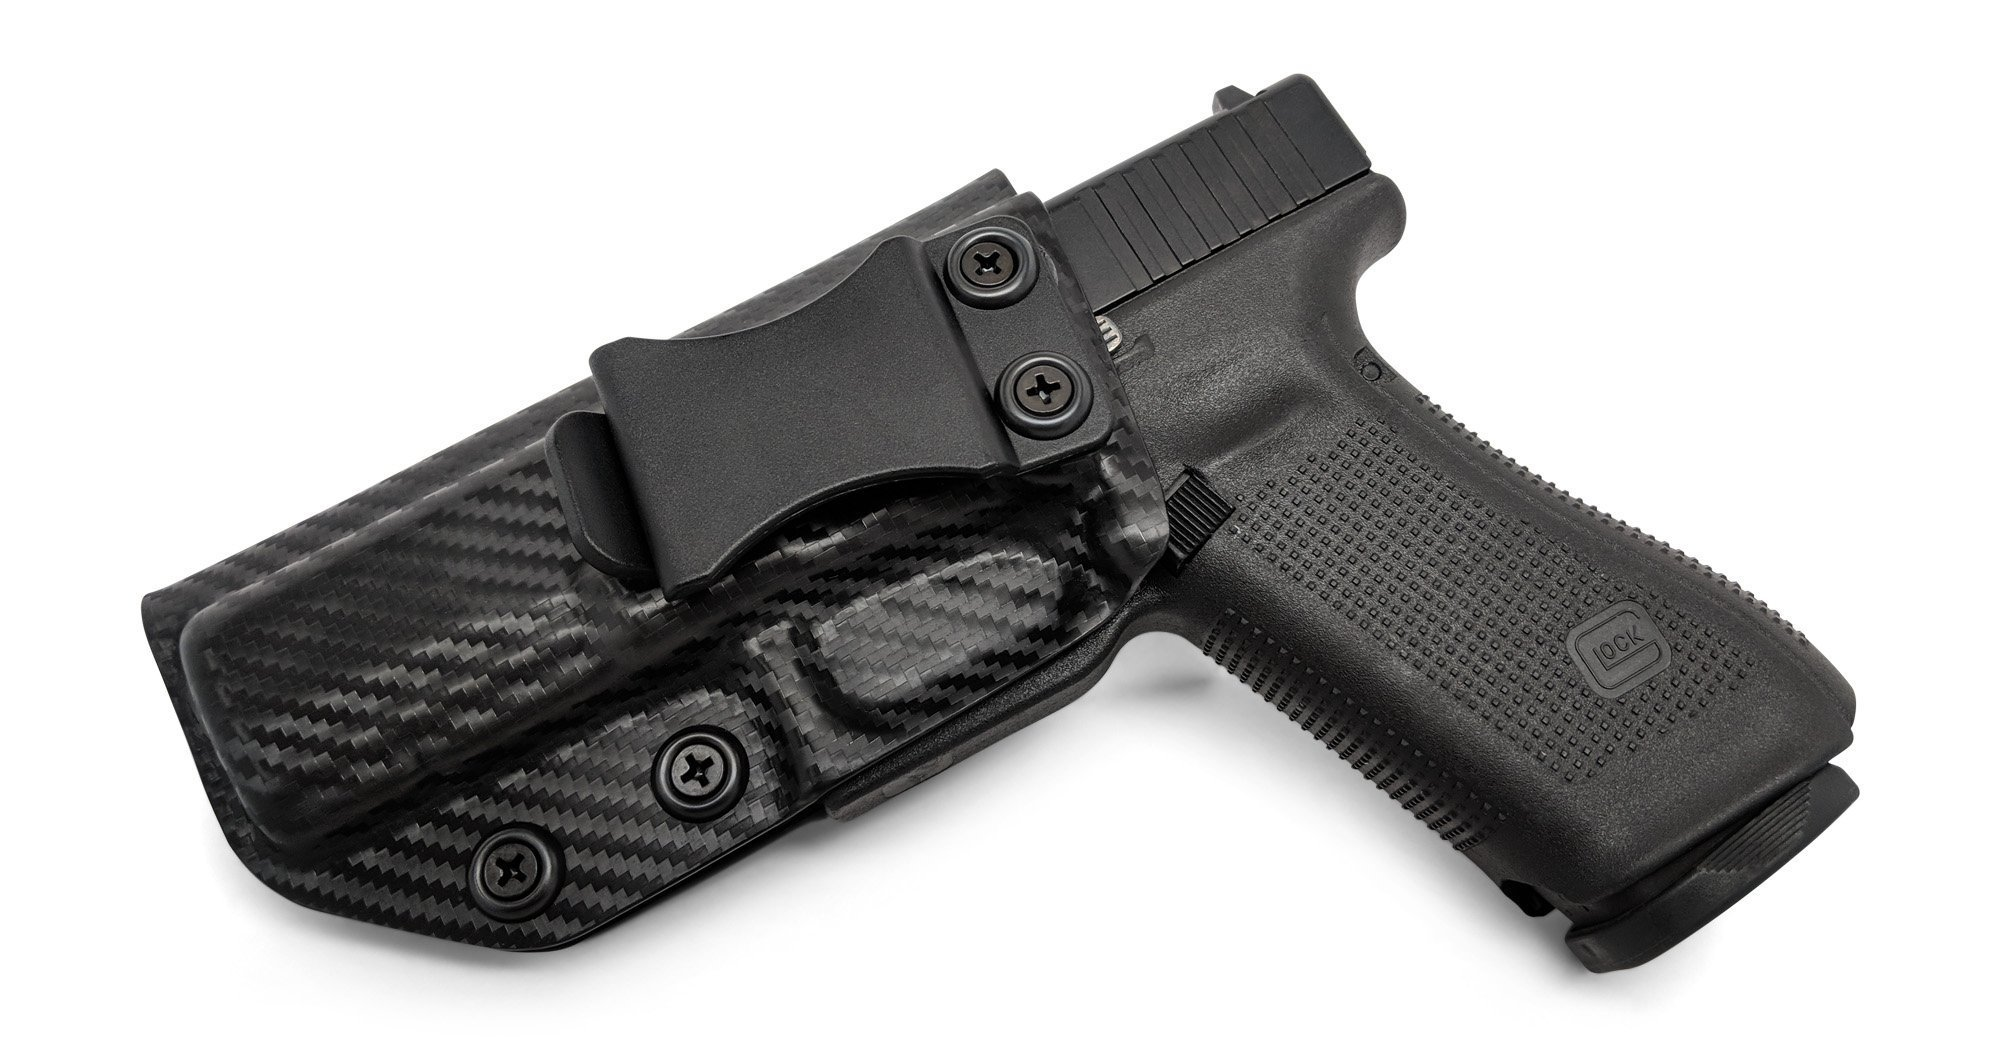 iwb-kydex-holster-glock-17-22-31-gen-1-5-iwb-kydex-holster-517